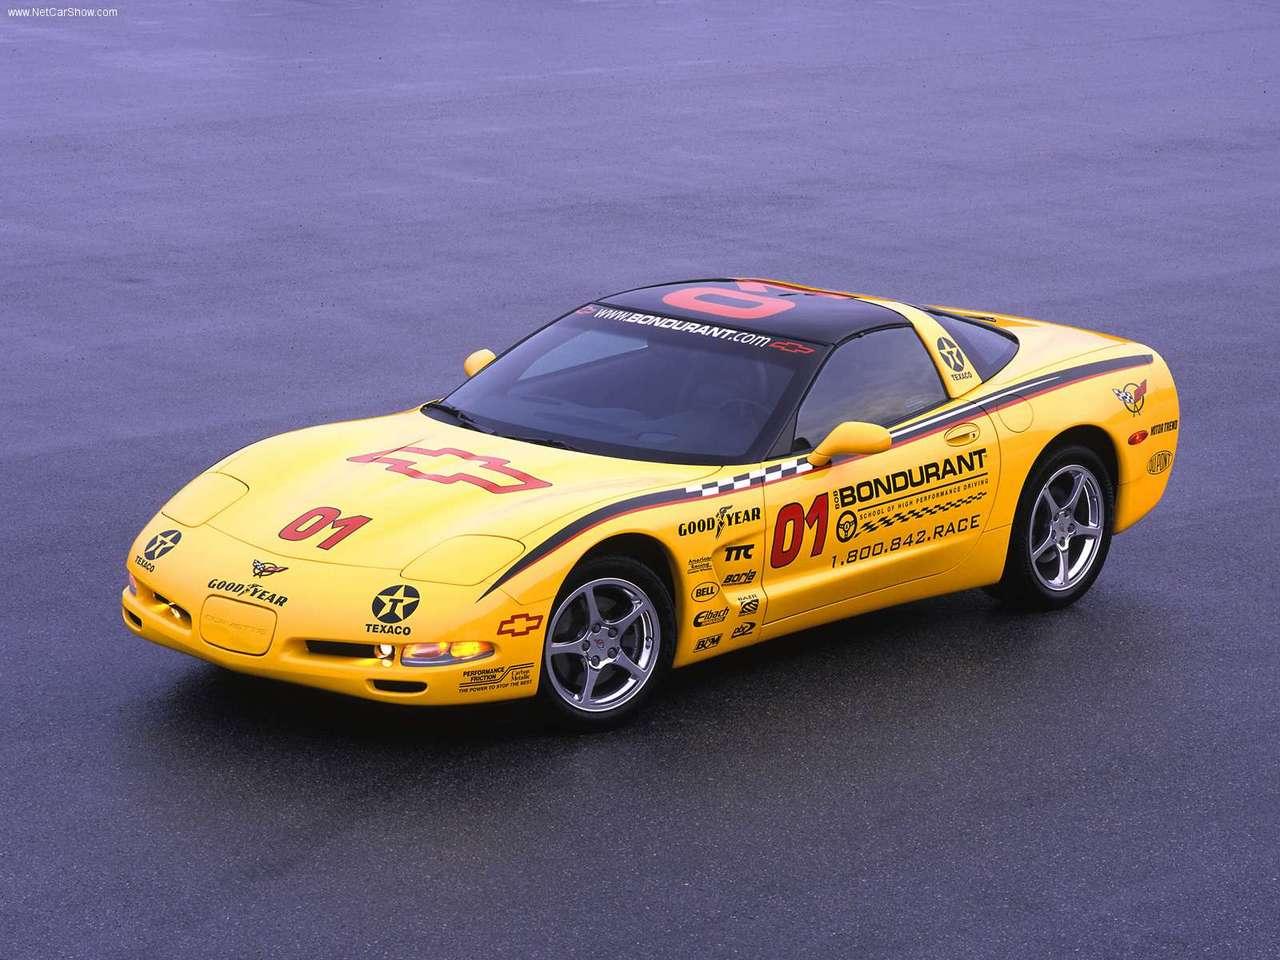 http://3.bp.blogspot.com/-TMBnTIkfn5M/TYZw35gn9sI/AAAAAAAAN5E/PZxYe7pBWwk/s1600/Chevrolet-Corvette_Bondurant_2003_1280x960_wallpaper_02.jpg